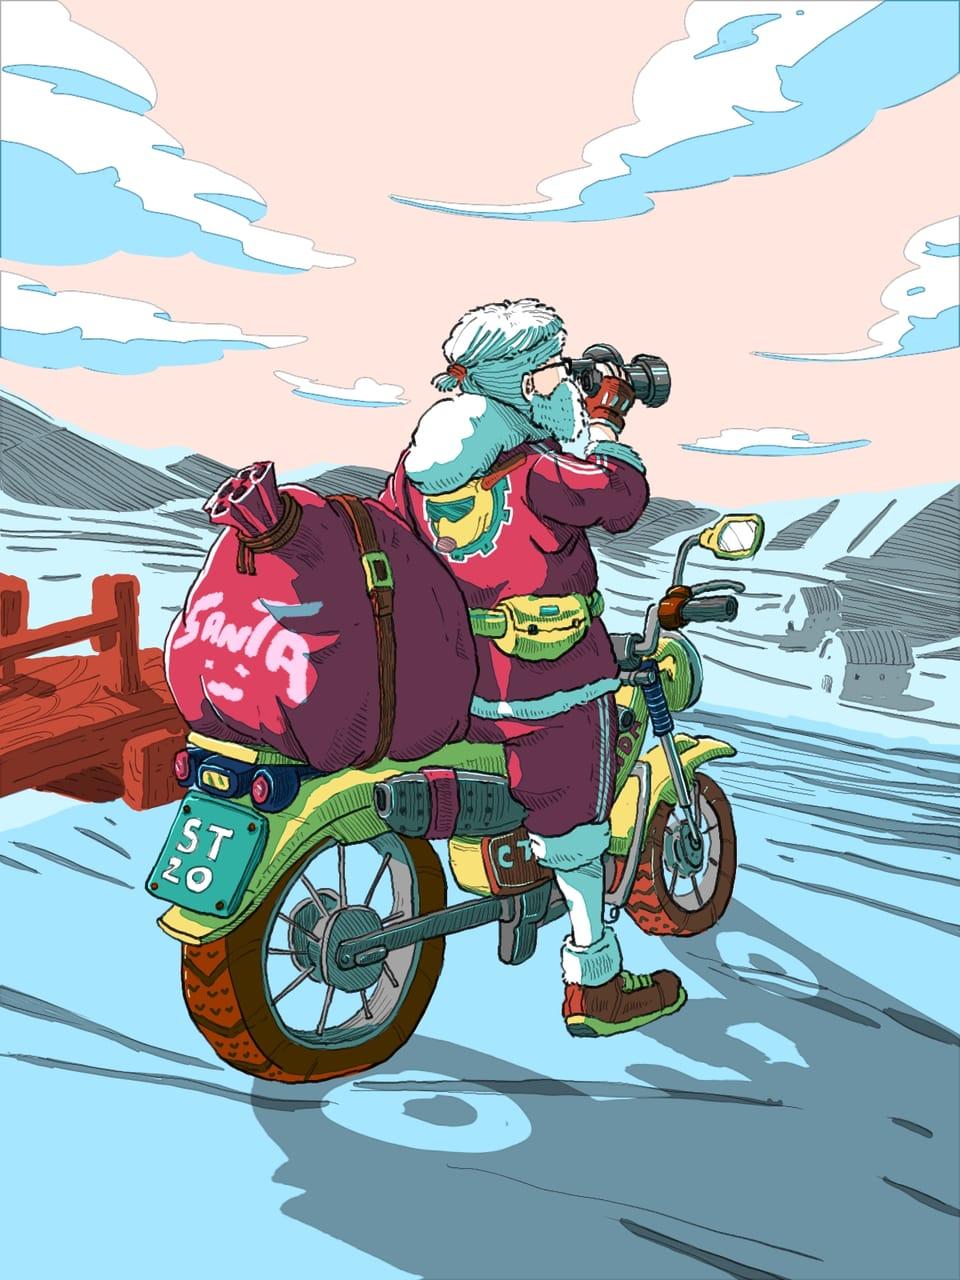 BADASS SANTA Illust of Wutikai December2020_Contest:Santa November2020_Contest:Cyberpunk Christmas sky landscapes Japanese_style motorcycle scenery red Santa motorbike hill Badass